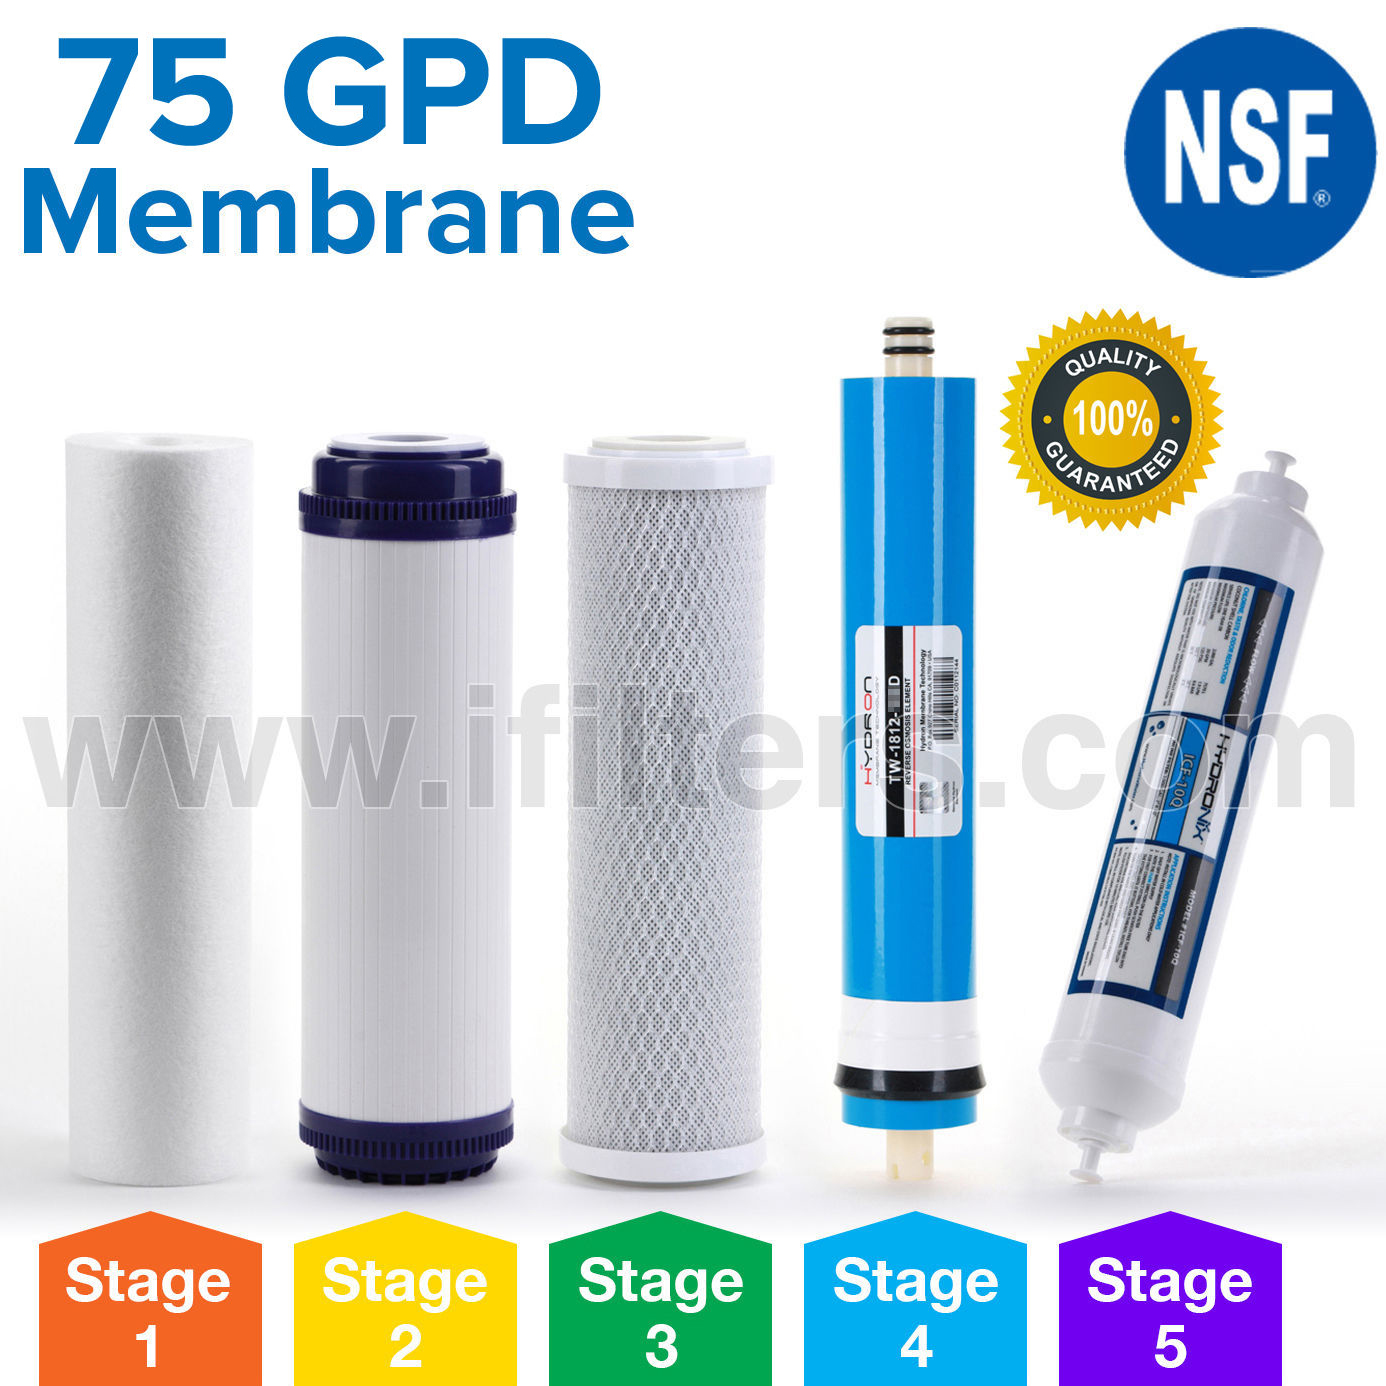 Reverse Osmosis Universal Replacement Filter Set RO Cartridges 5 pcs w/ 75 GPD Membrane